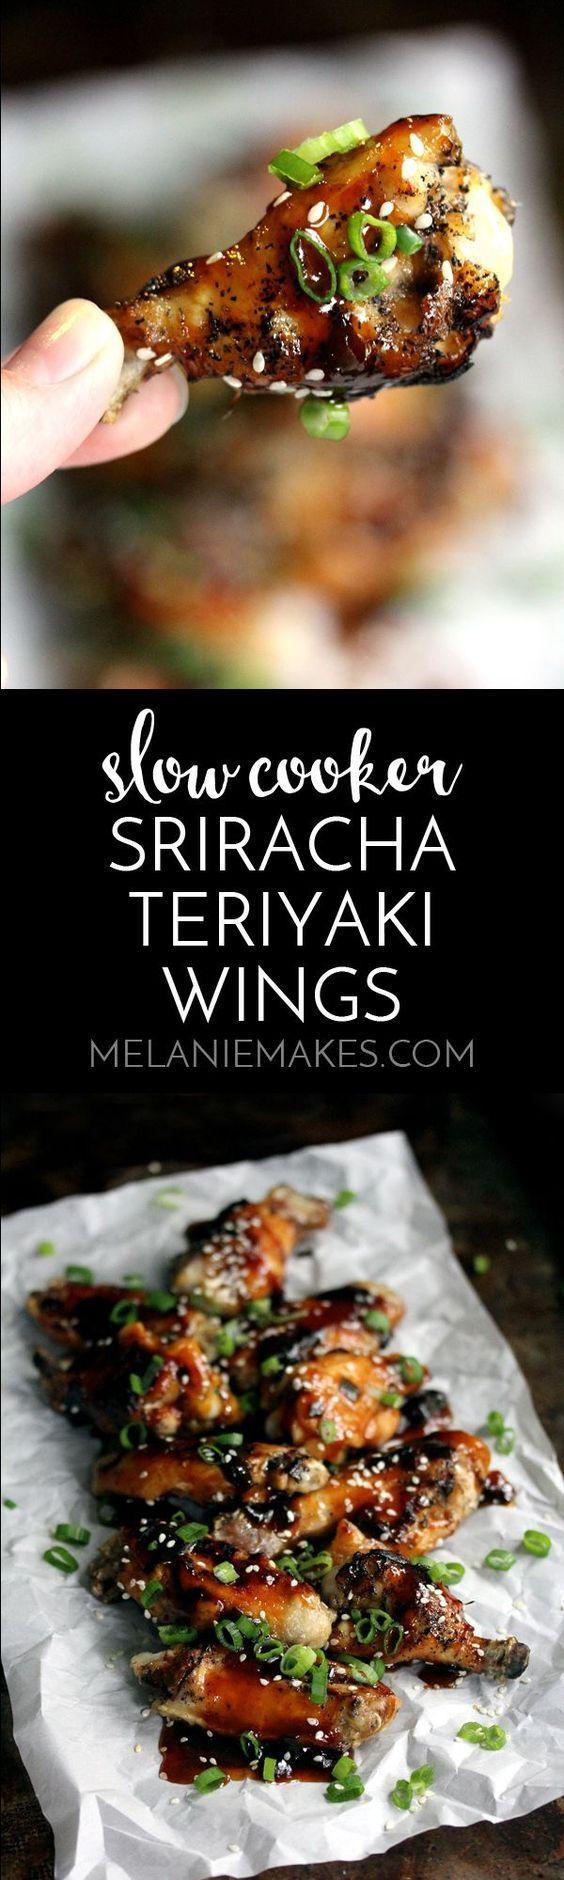 Hochzeit - Slow Cooker Sriracha Teriyaki Wings